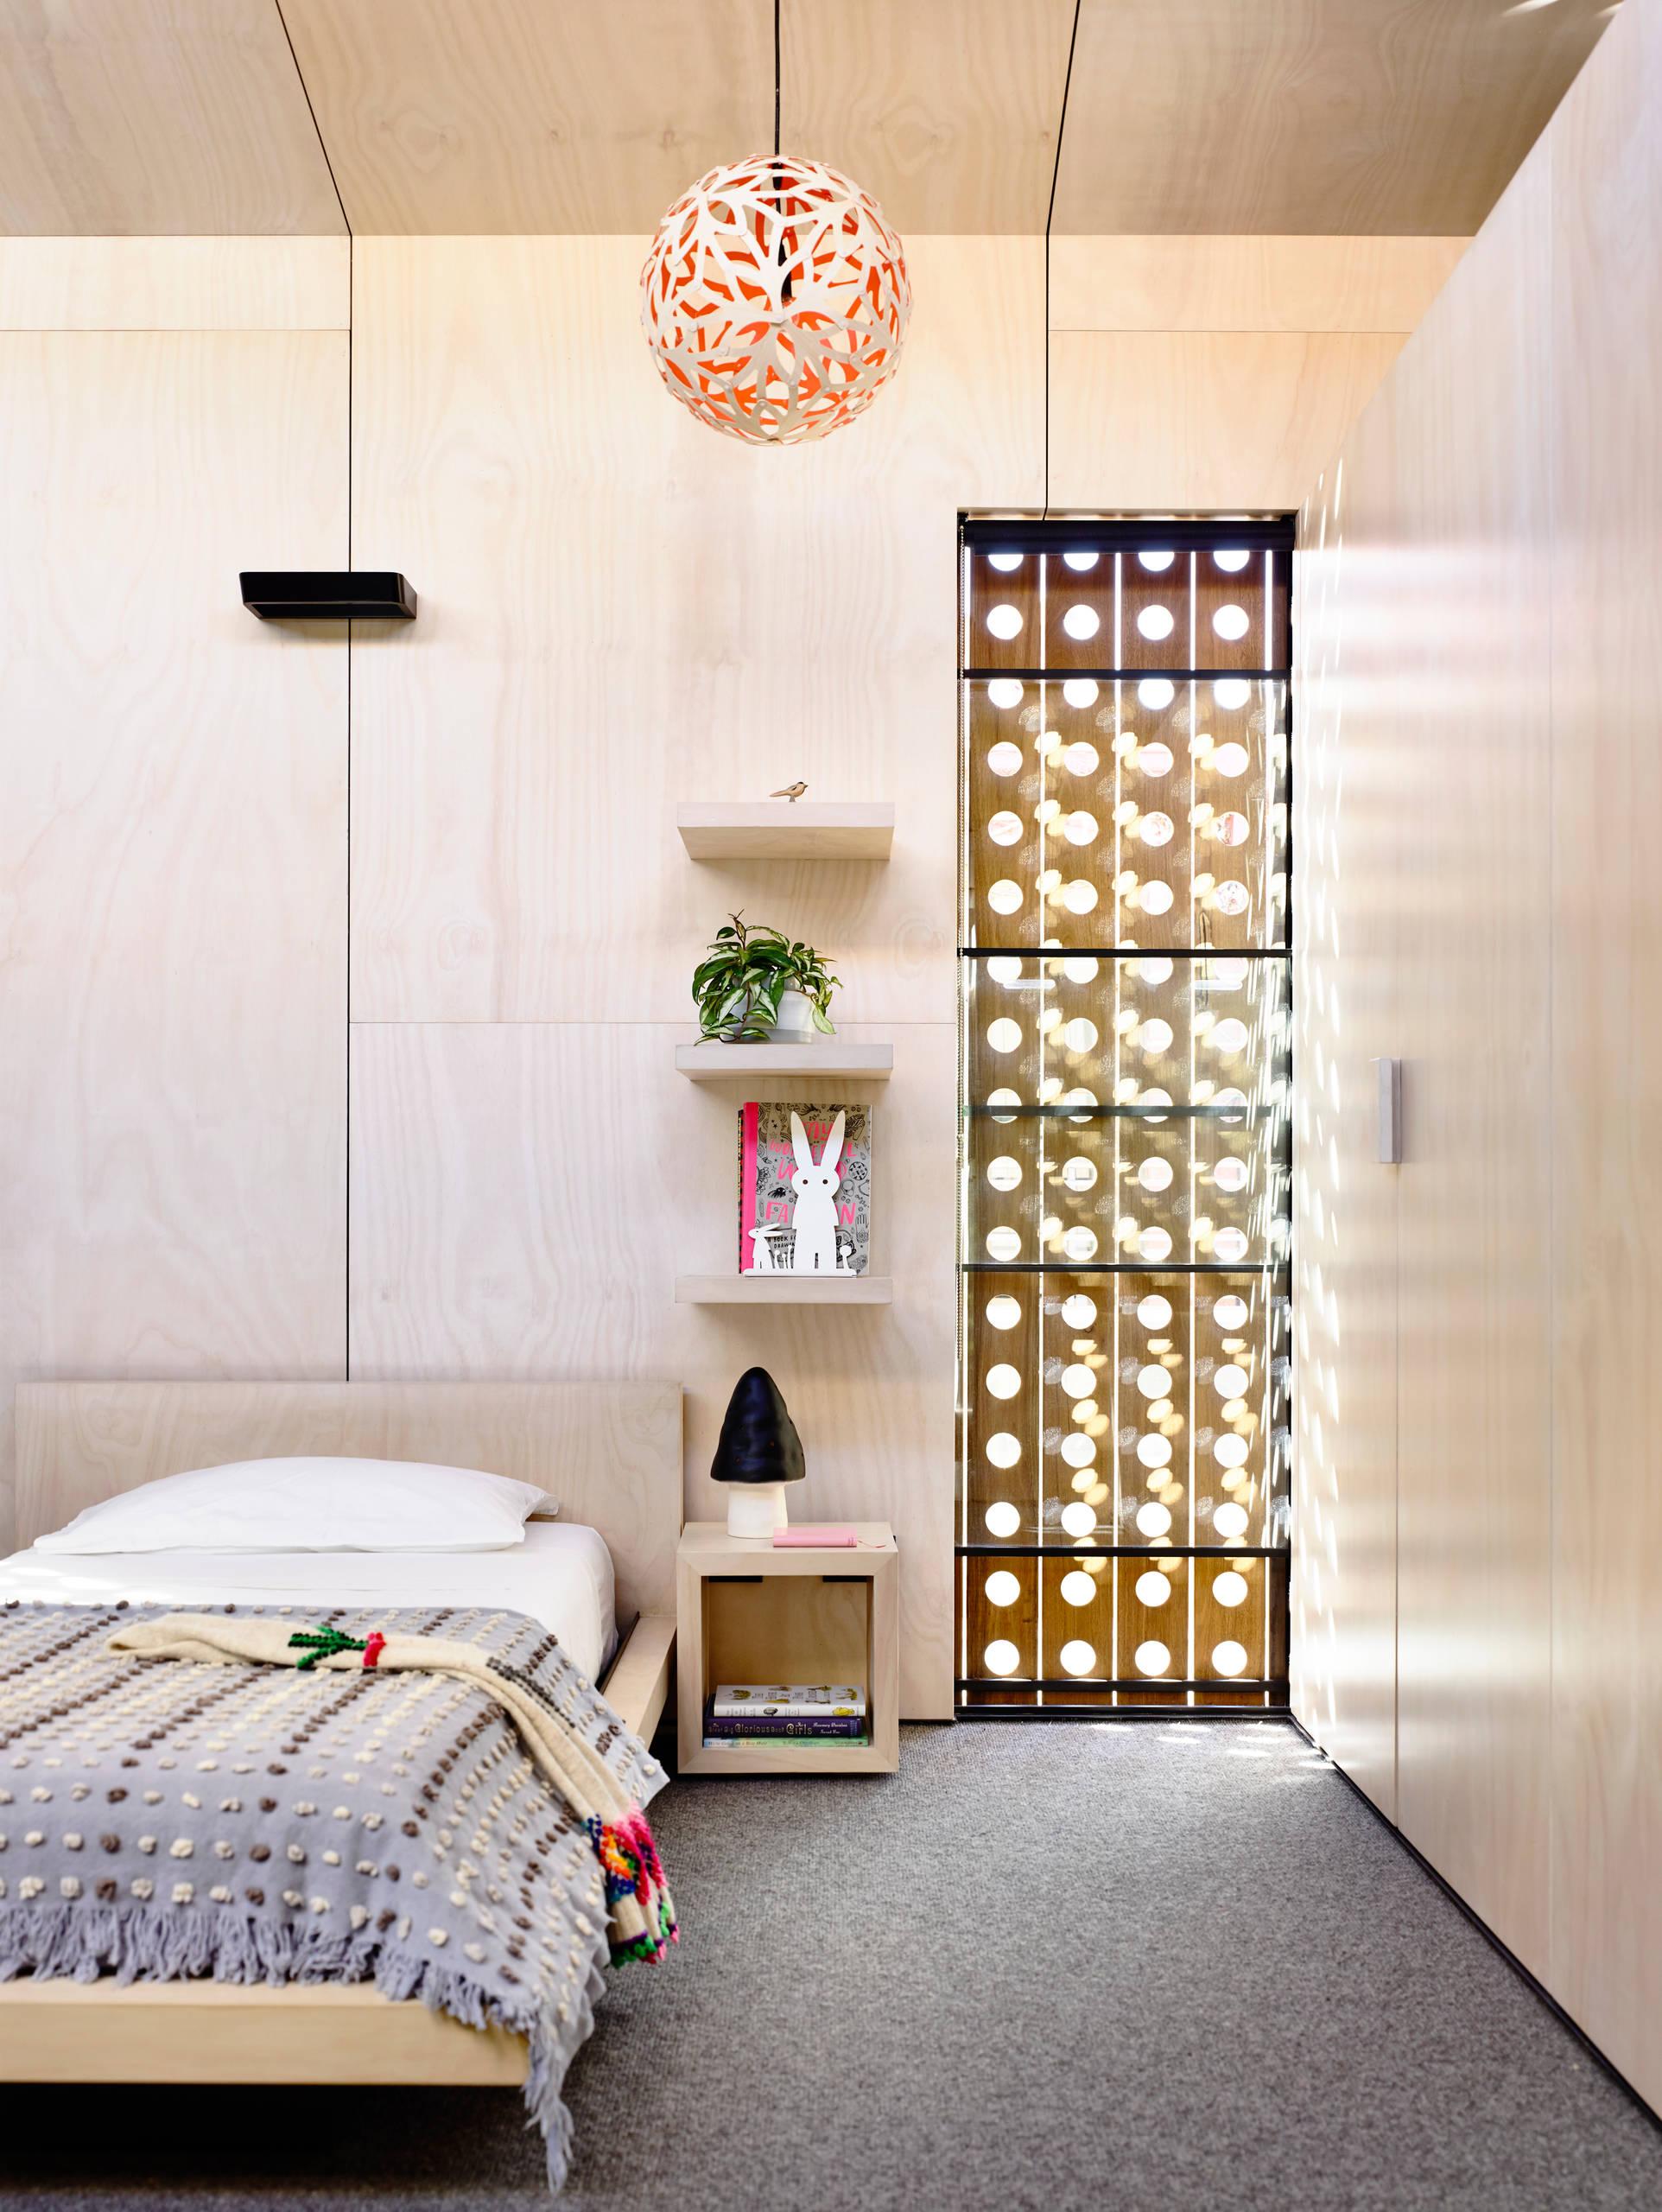 Teenager Bedroom Designs: 15 Enjoyable Modern Kids' Room Designs That Will Entertain